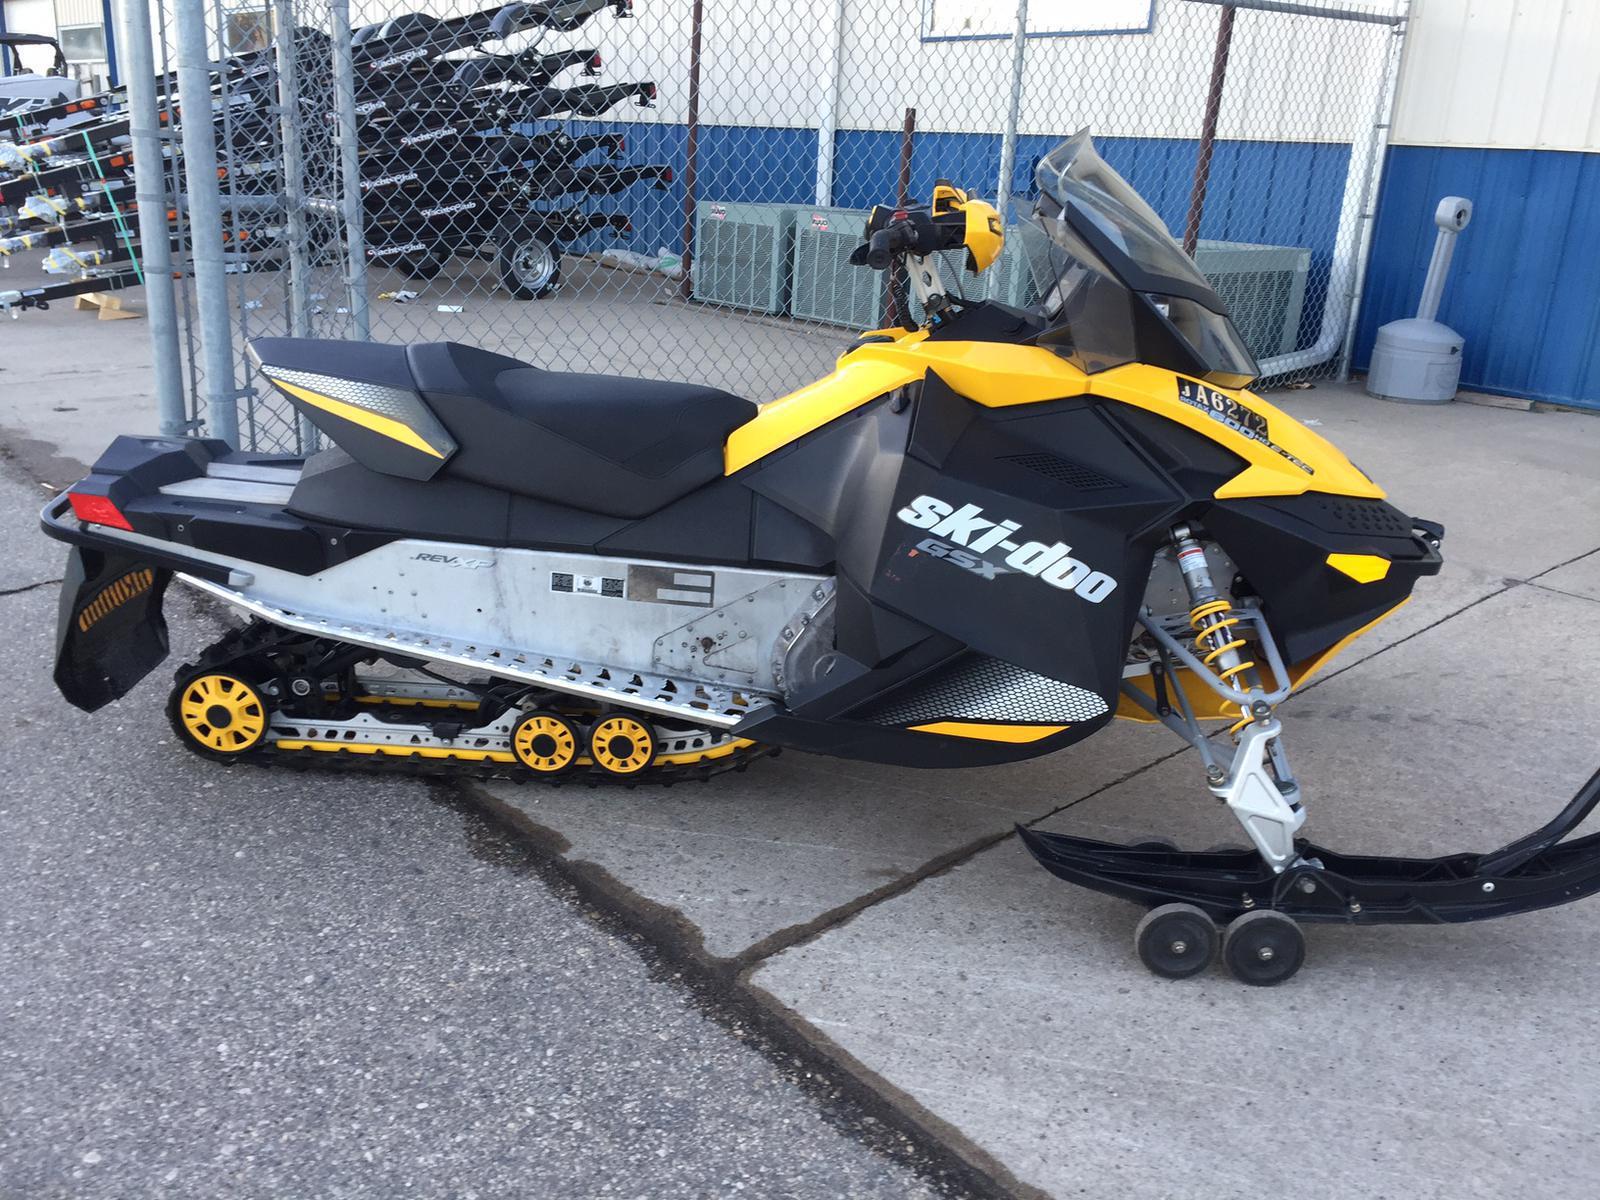 Snowmobile From Ski Doo Motor Sports Of Willmar Mn 800 Rotax 600 Sdi Engine Diagram 2012 Gsx Le Ho Etec